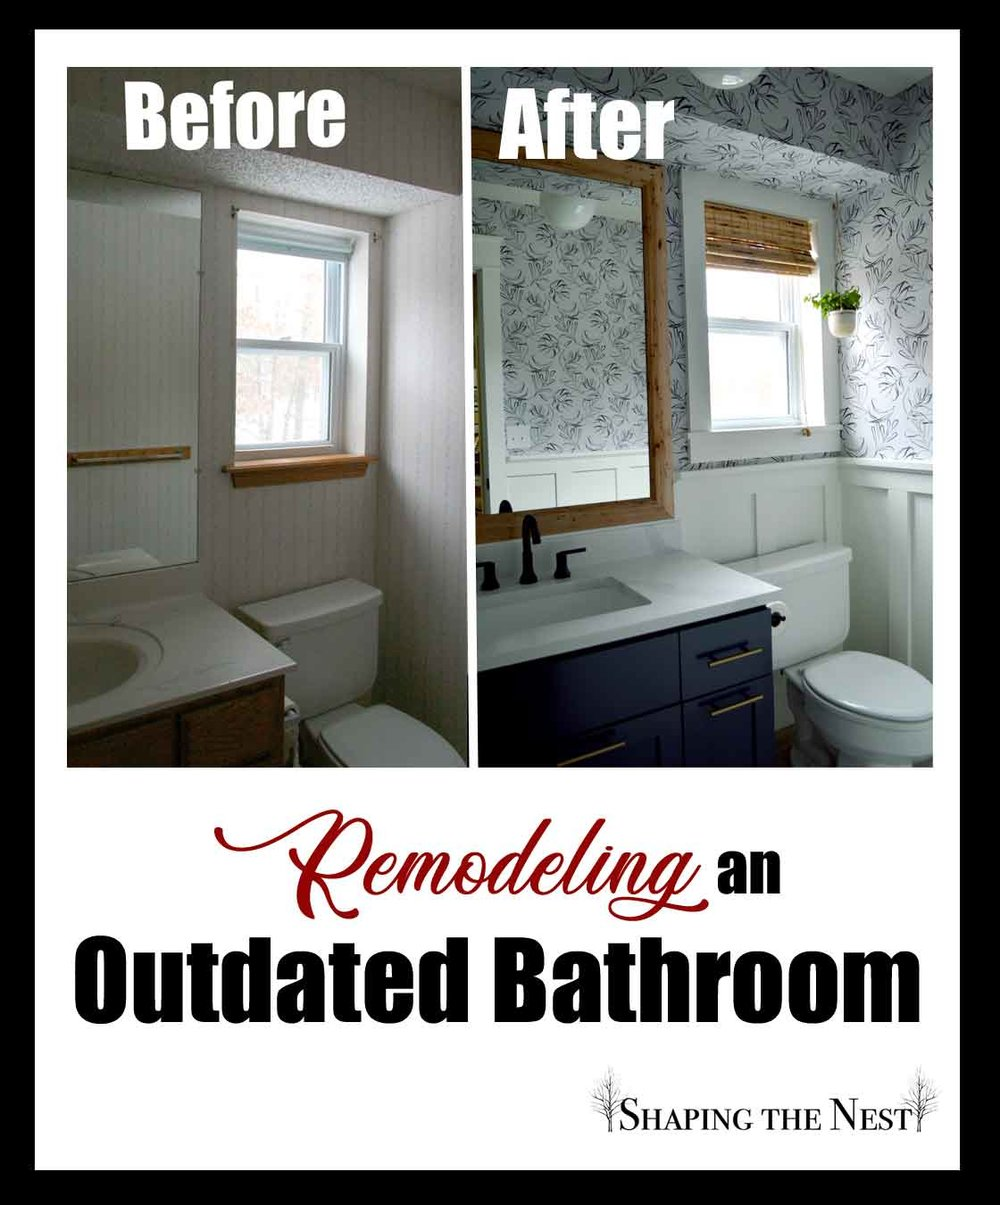 Remodeling-Outdated-Bathroom.jpg